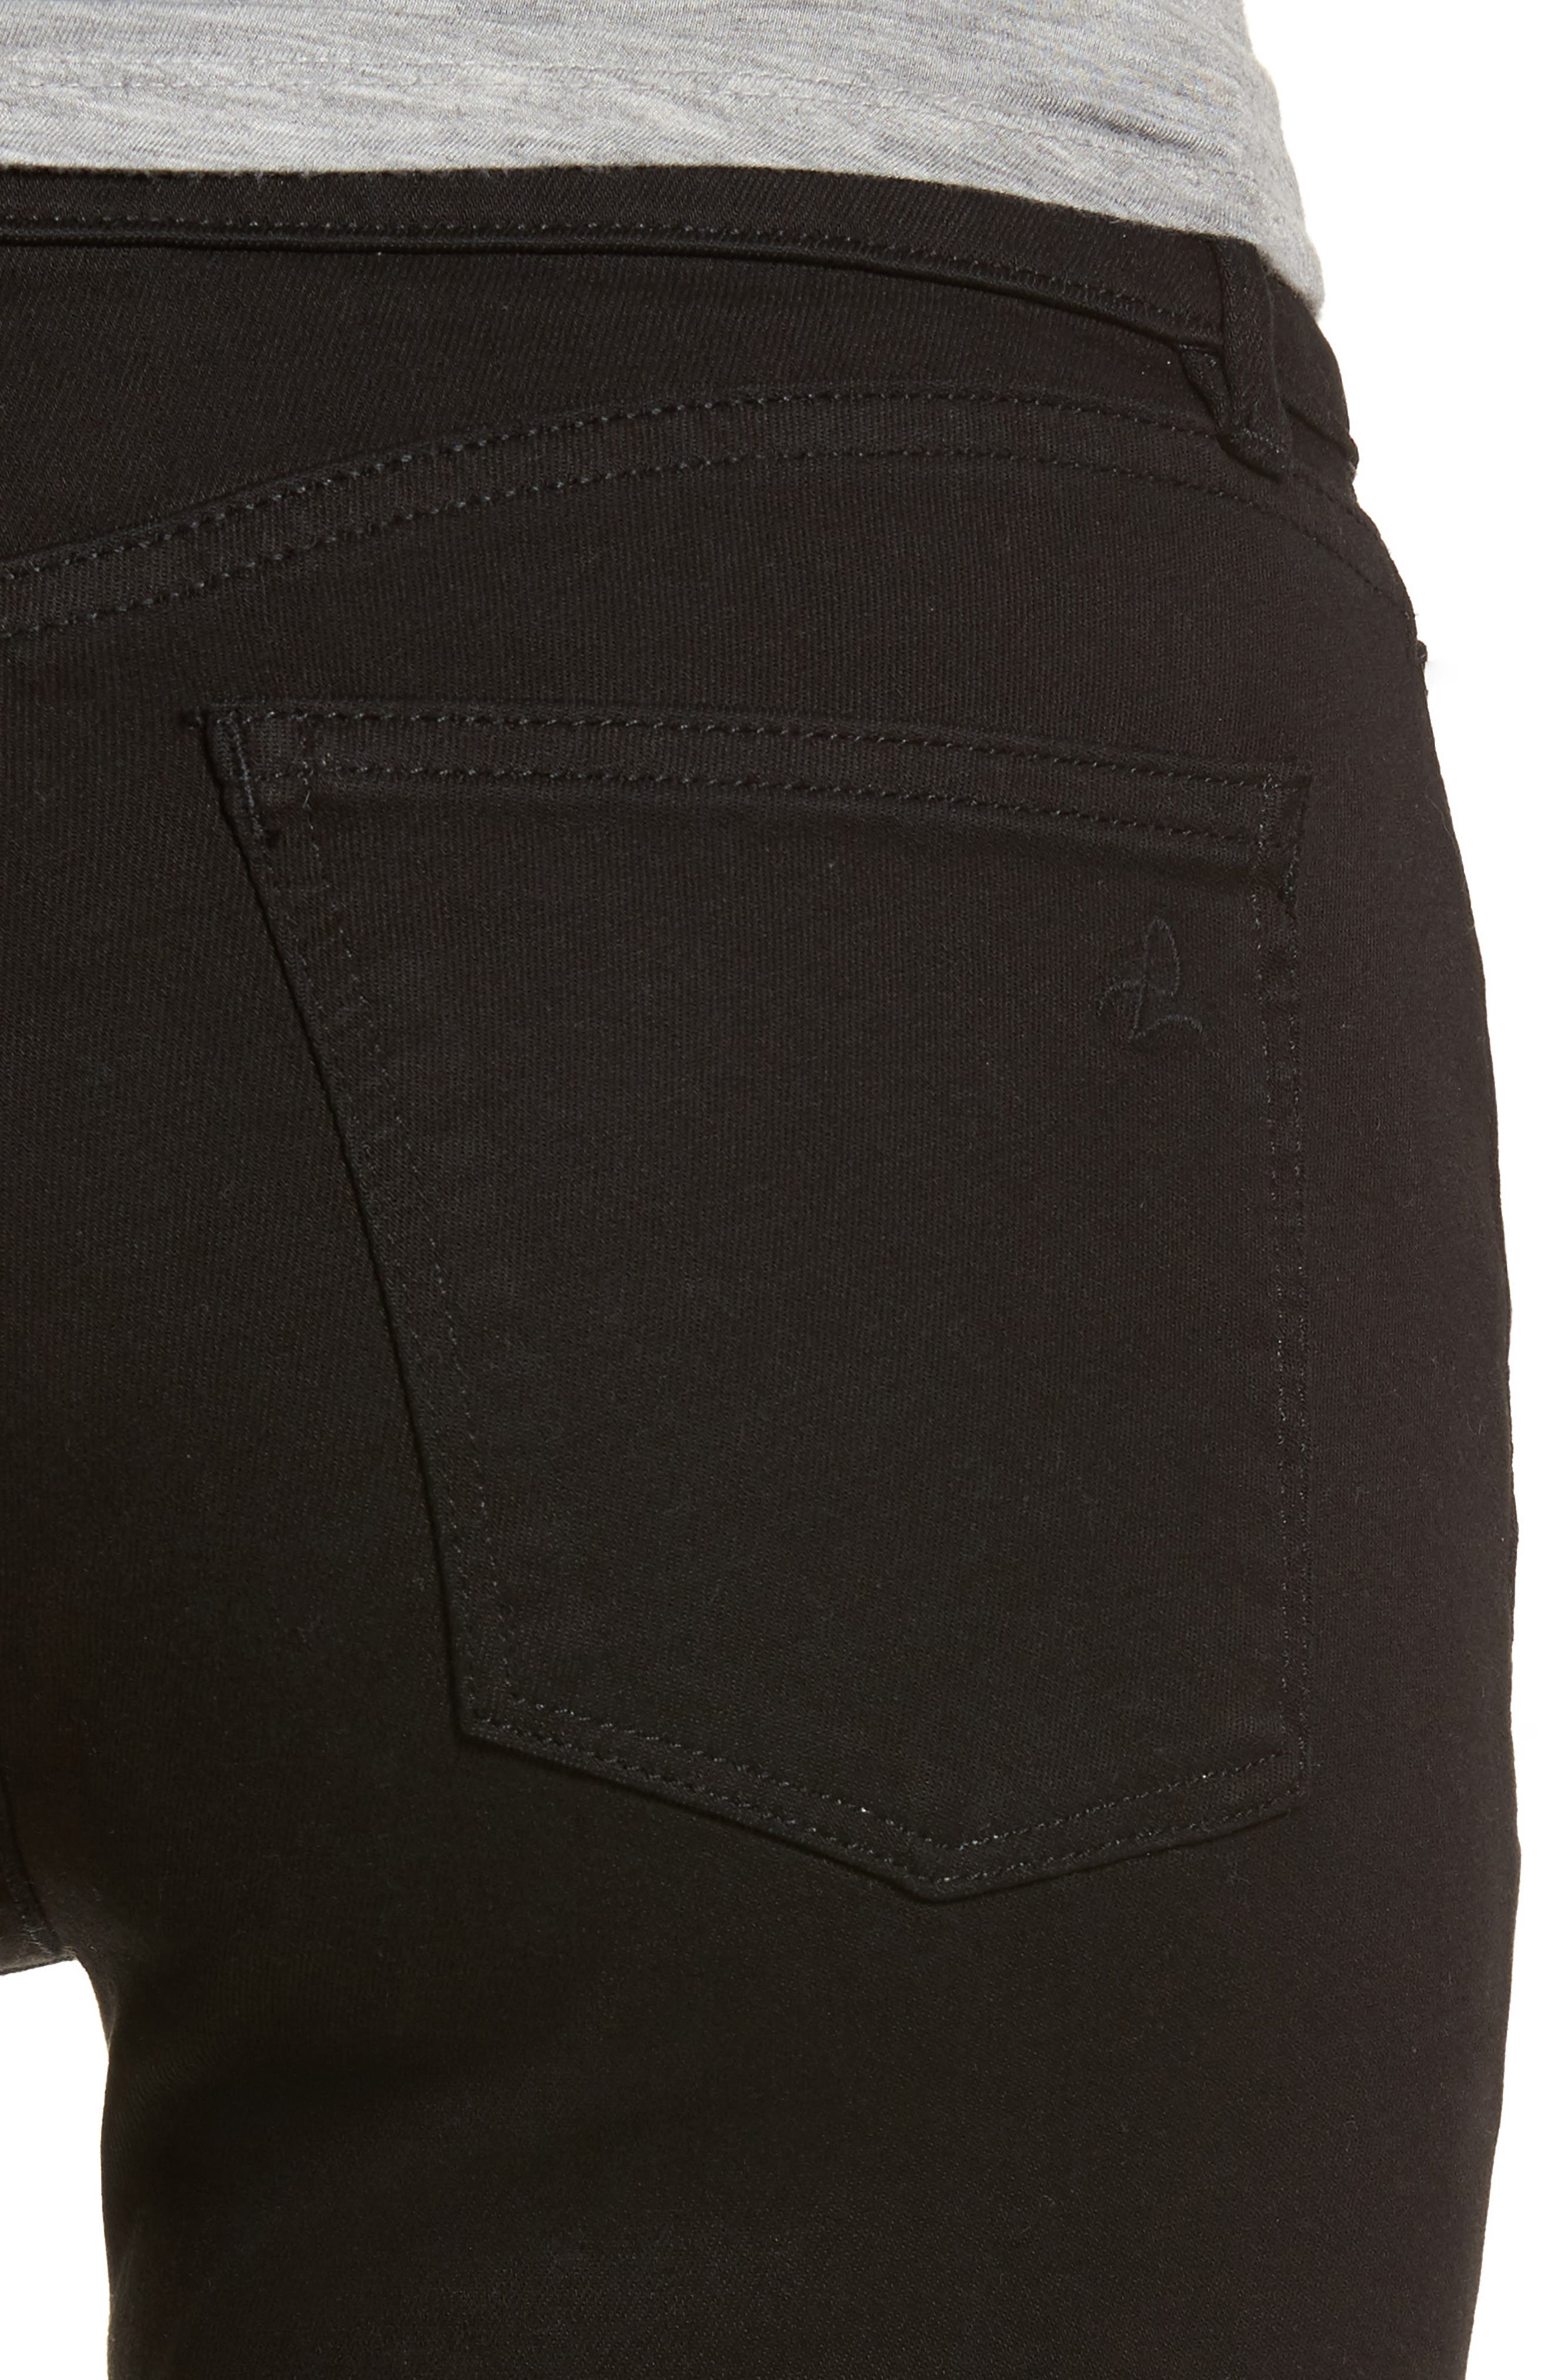 Coco Curvy Straight Leg Jeans,                             Alternate thumbnail 4, color,                             001